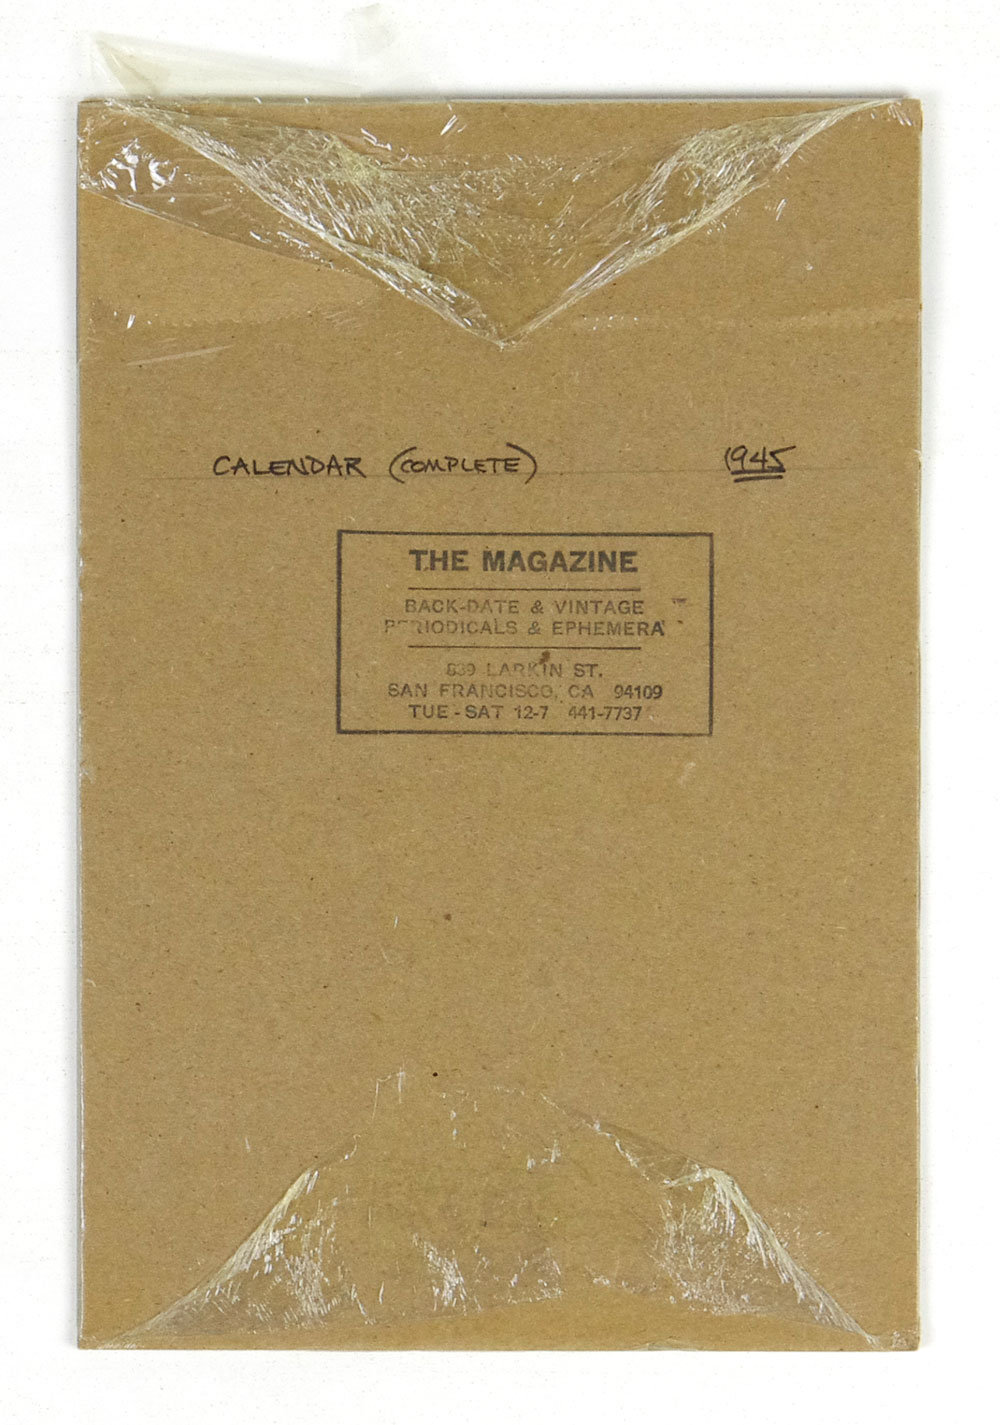 1945 Vintage Calendar Cecelia Margret Meagher Coronet Magazine Cover Girl